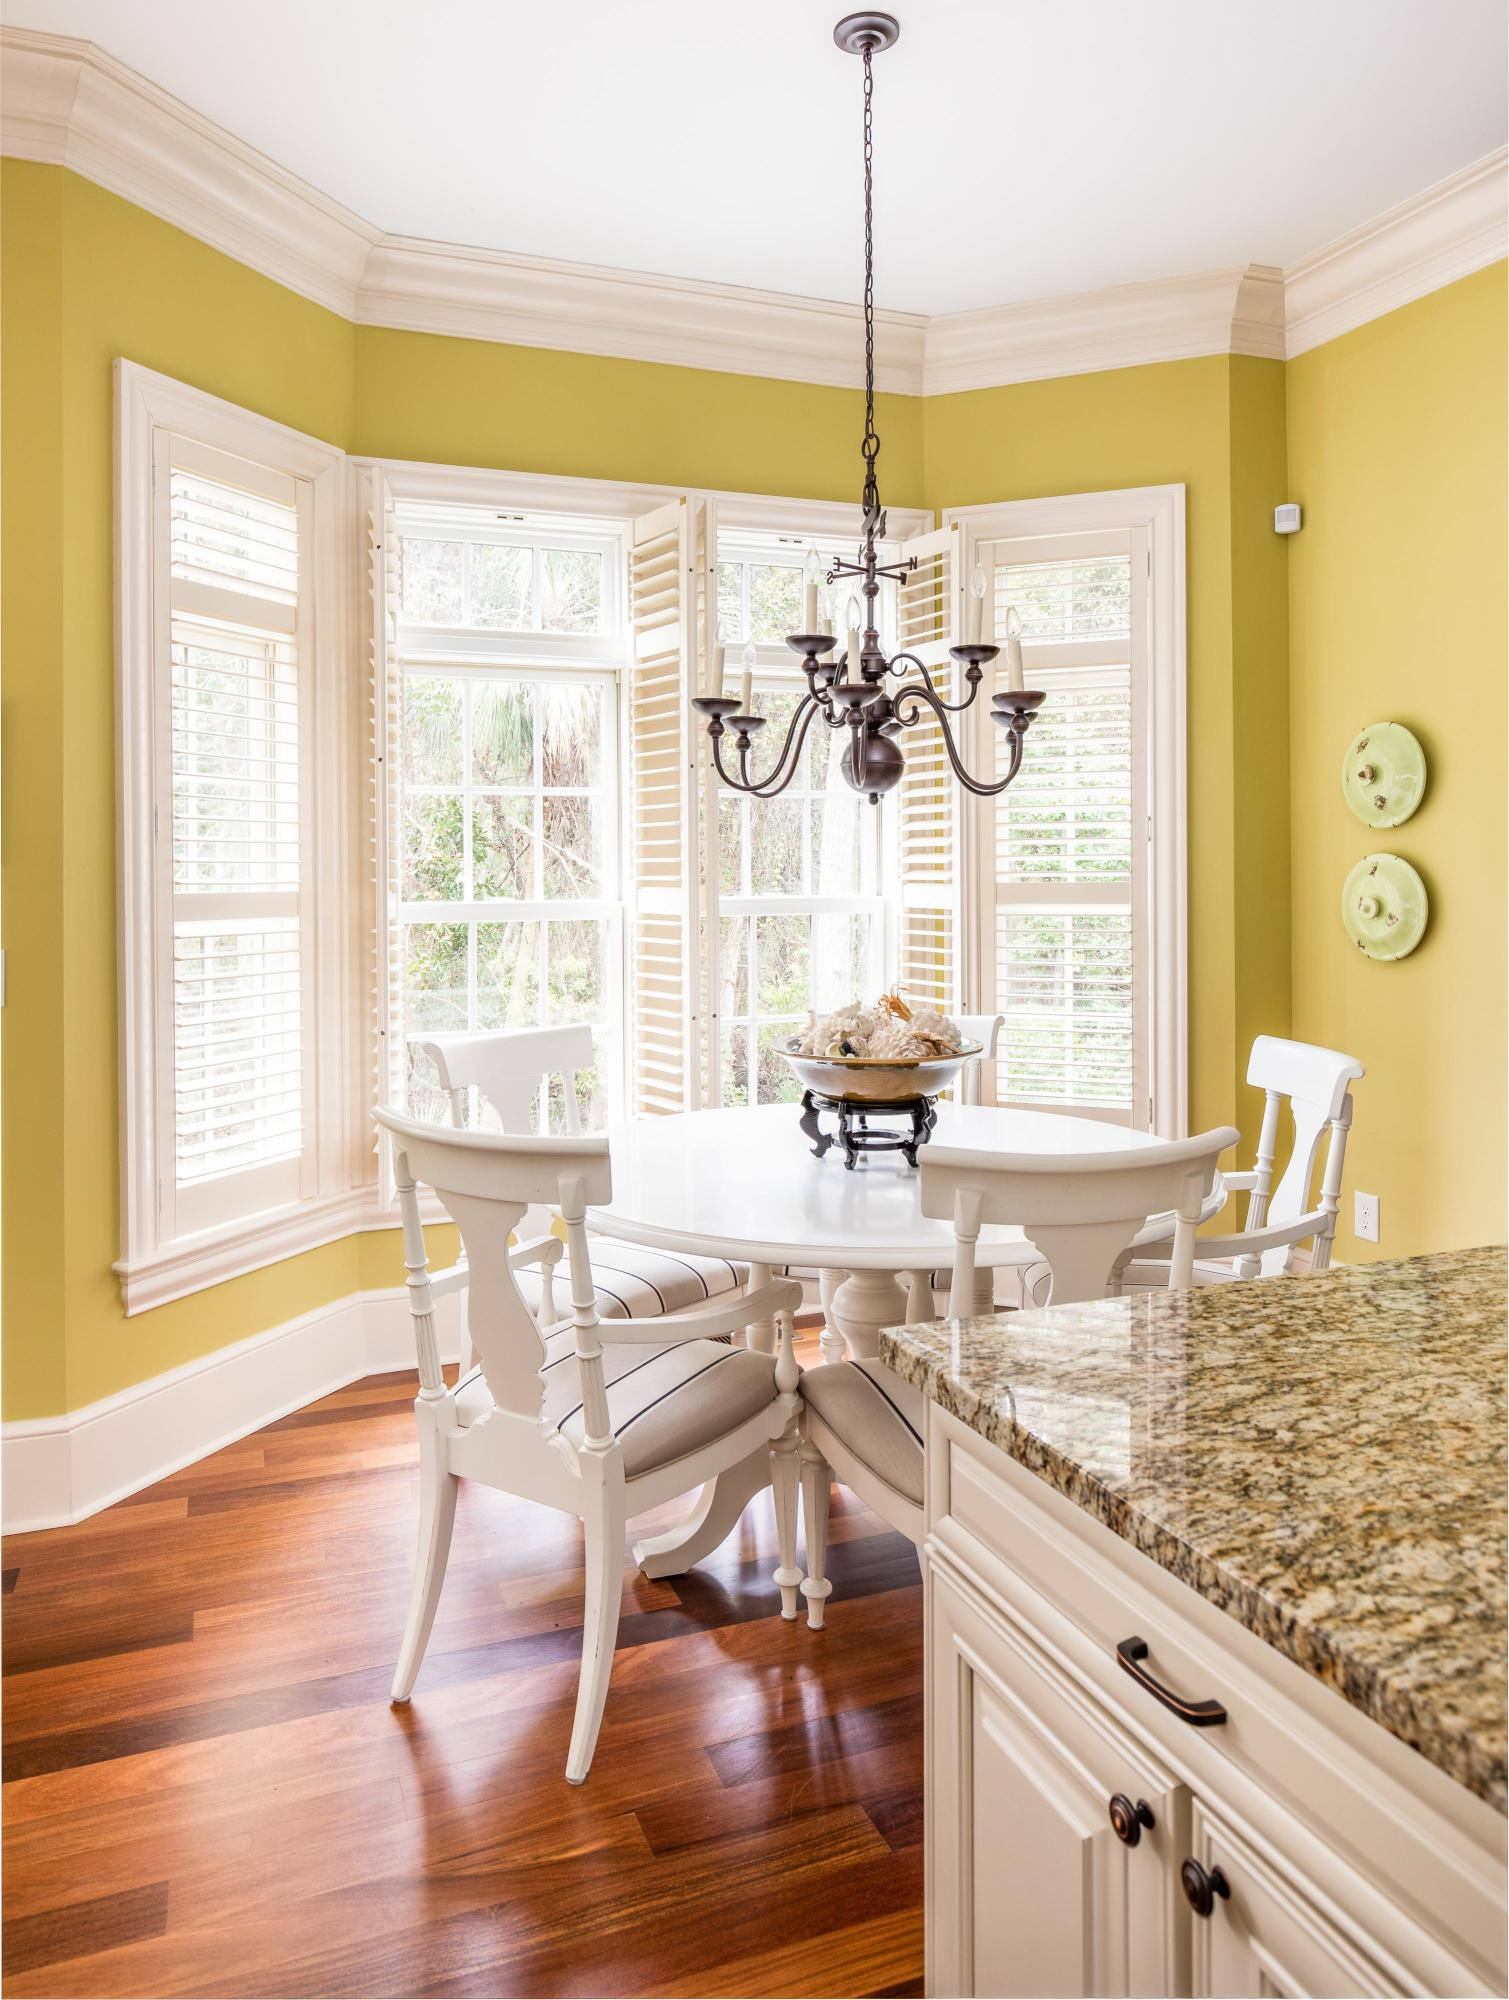 Seabrook Island Homes For Sale - 3125 Baywood, Seabrook Island, SC - 13